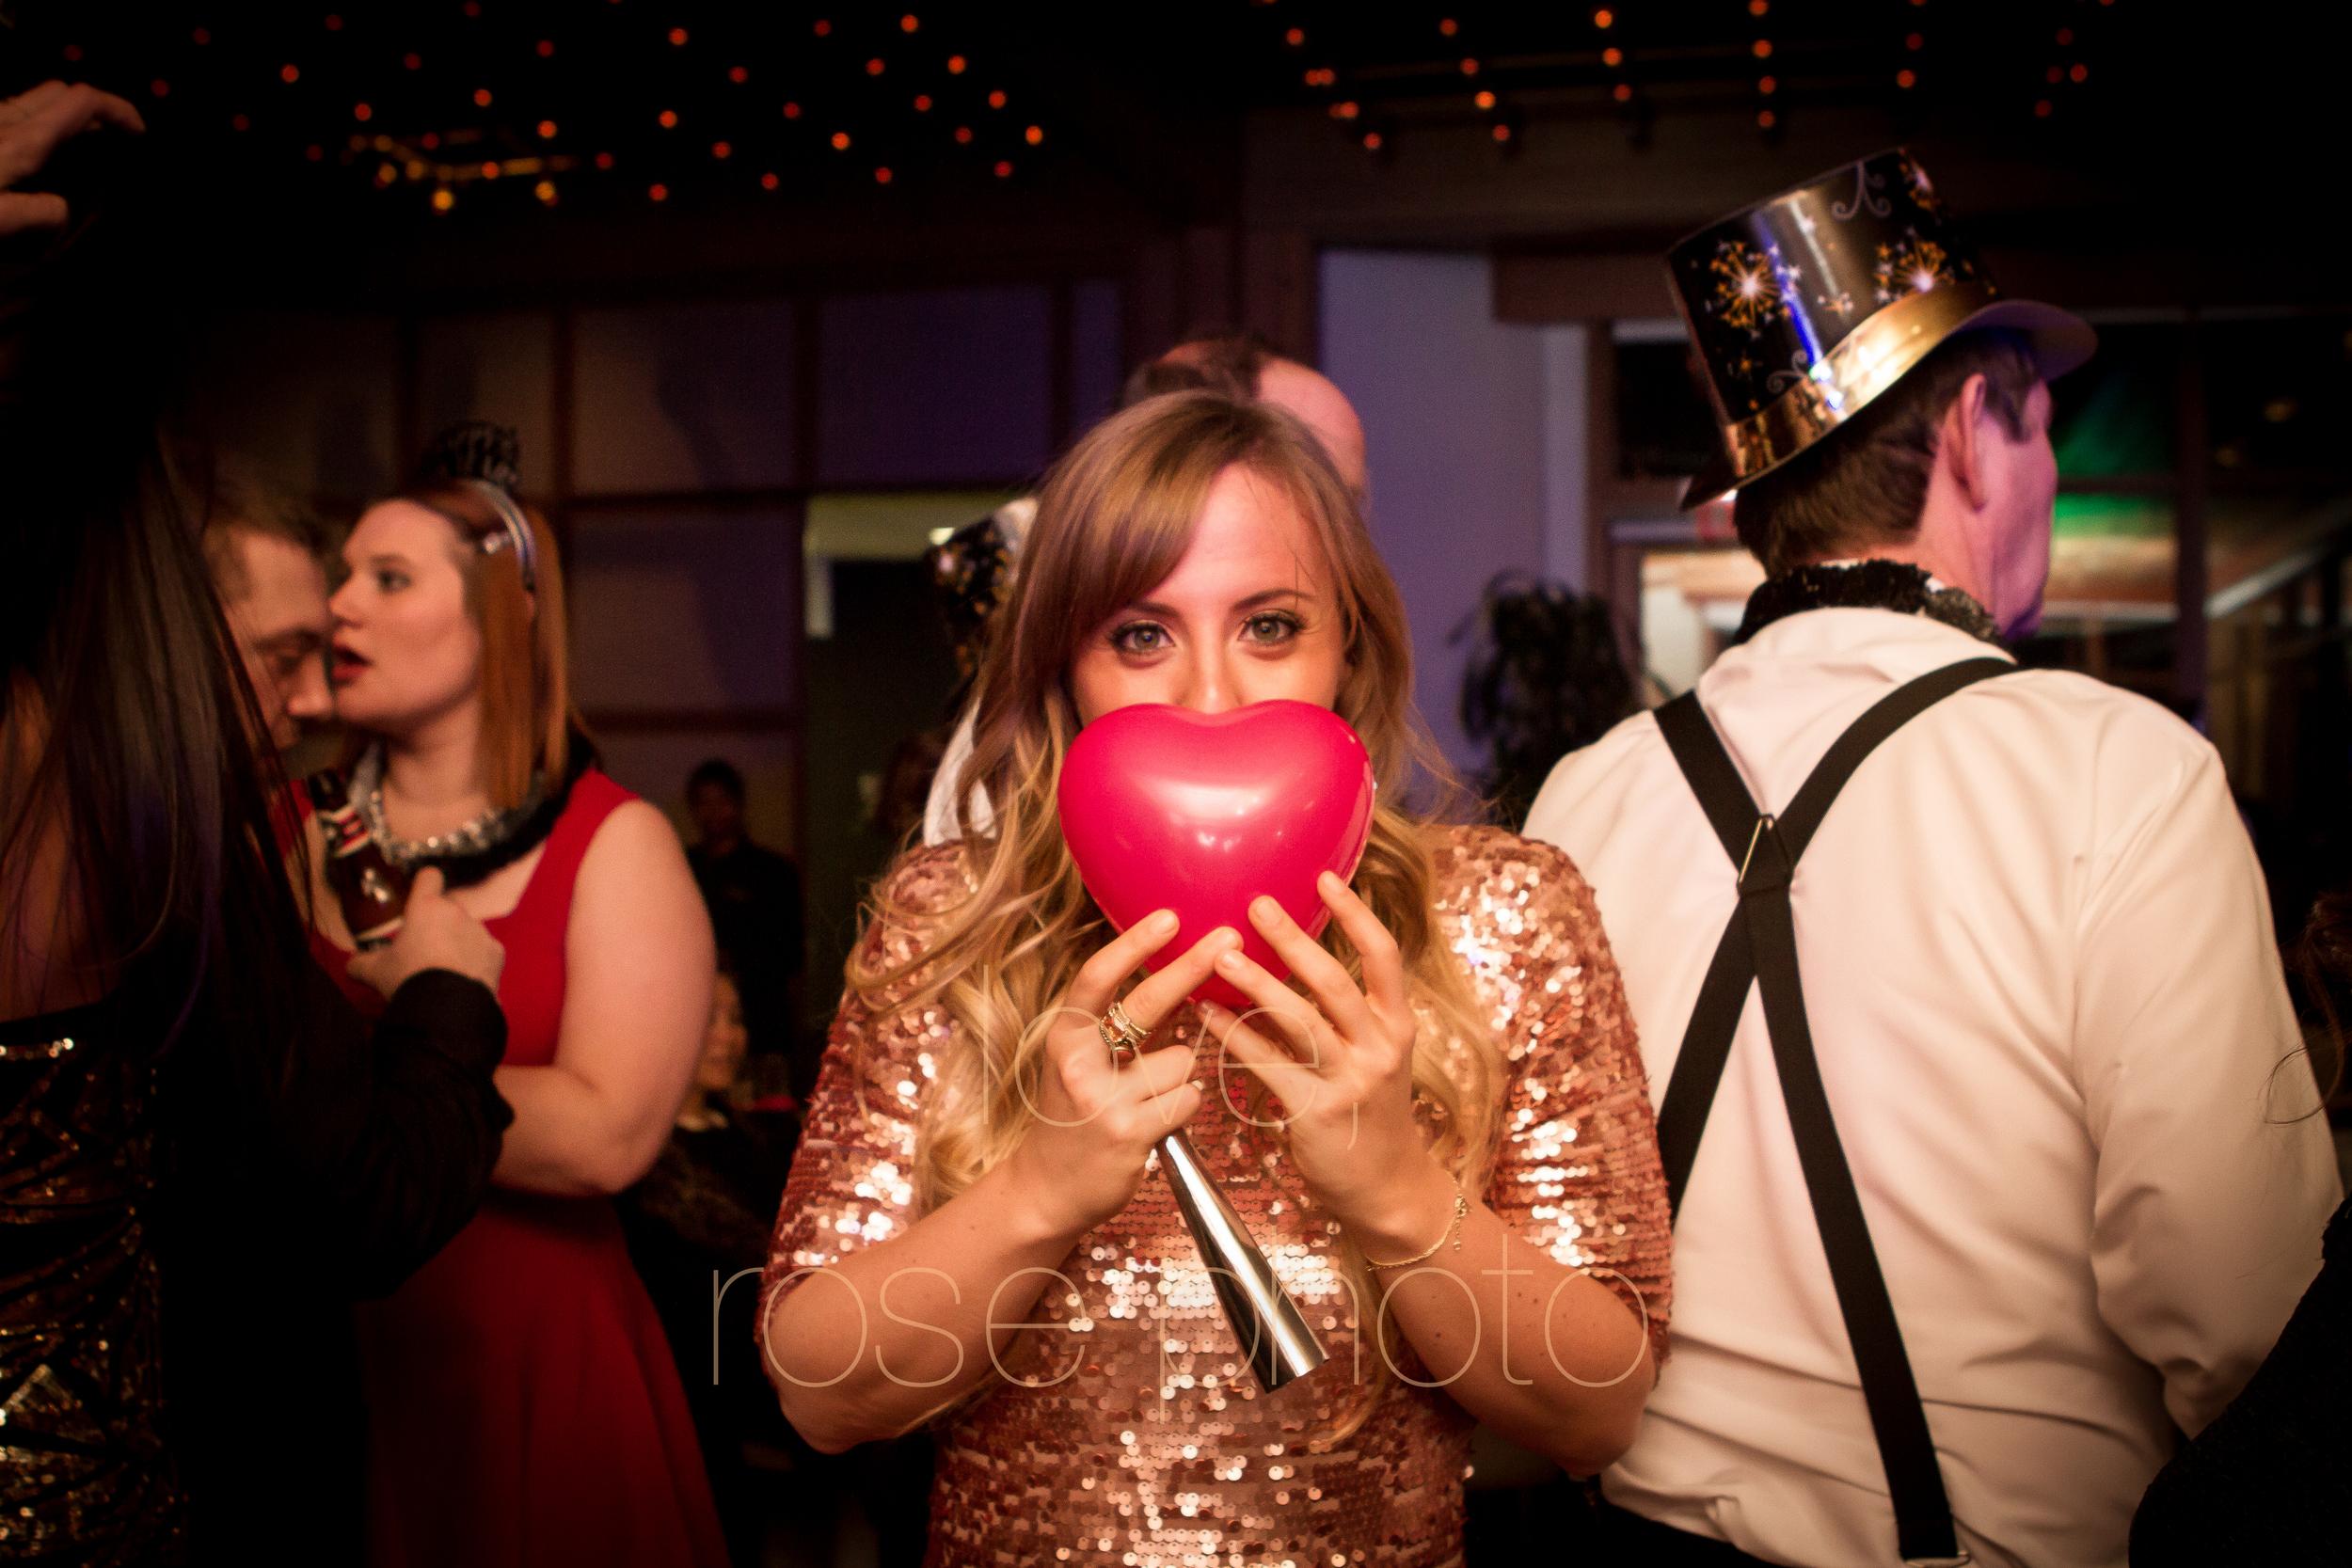 katie + even new years eve chicago oak brook mcdonalds lodge 2014 polish wedding balloon drop champagne-019.jpg